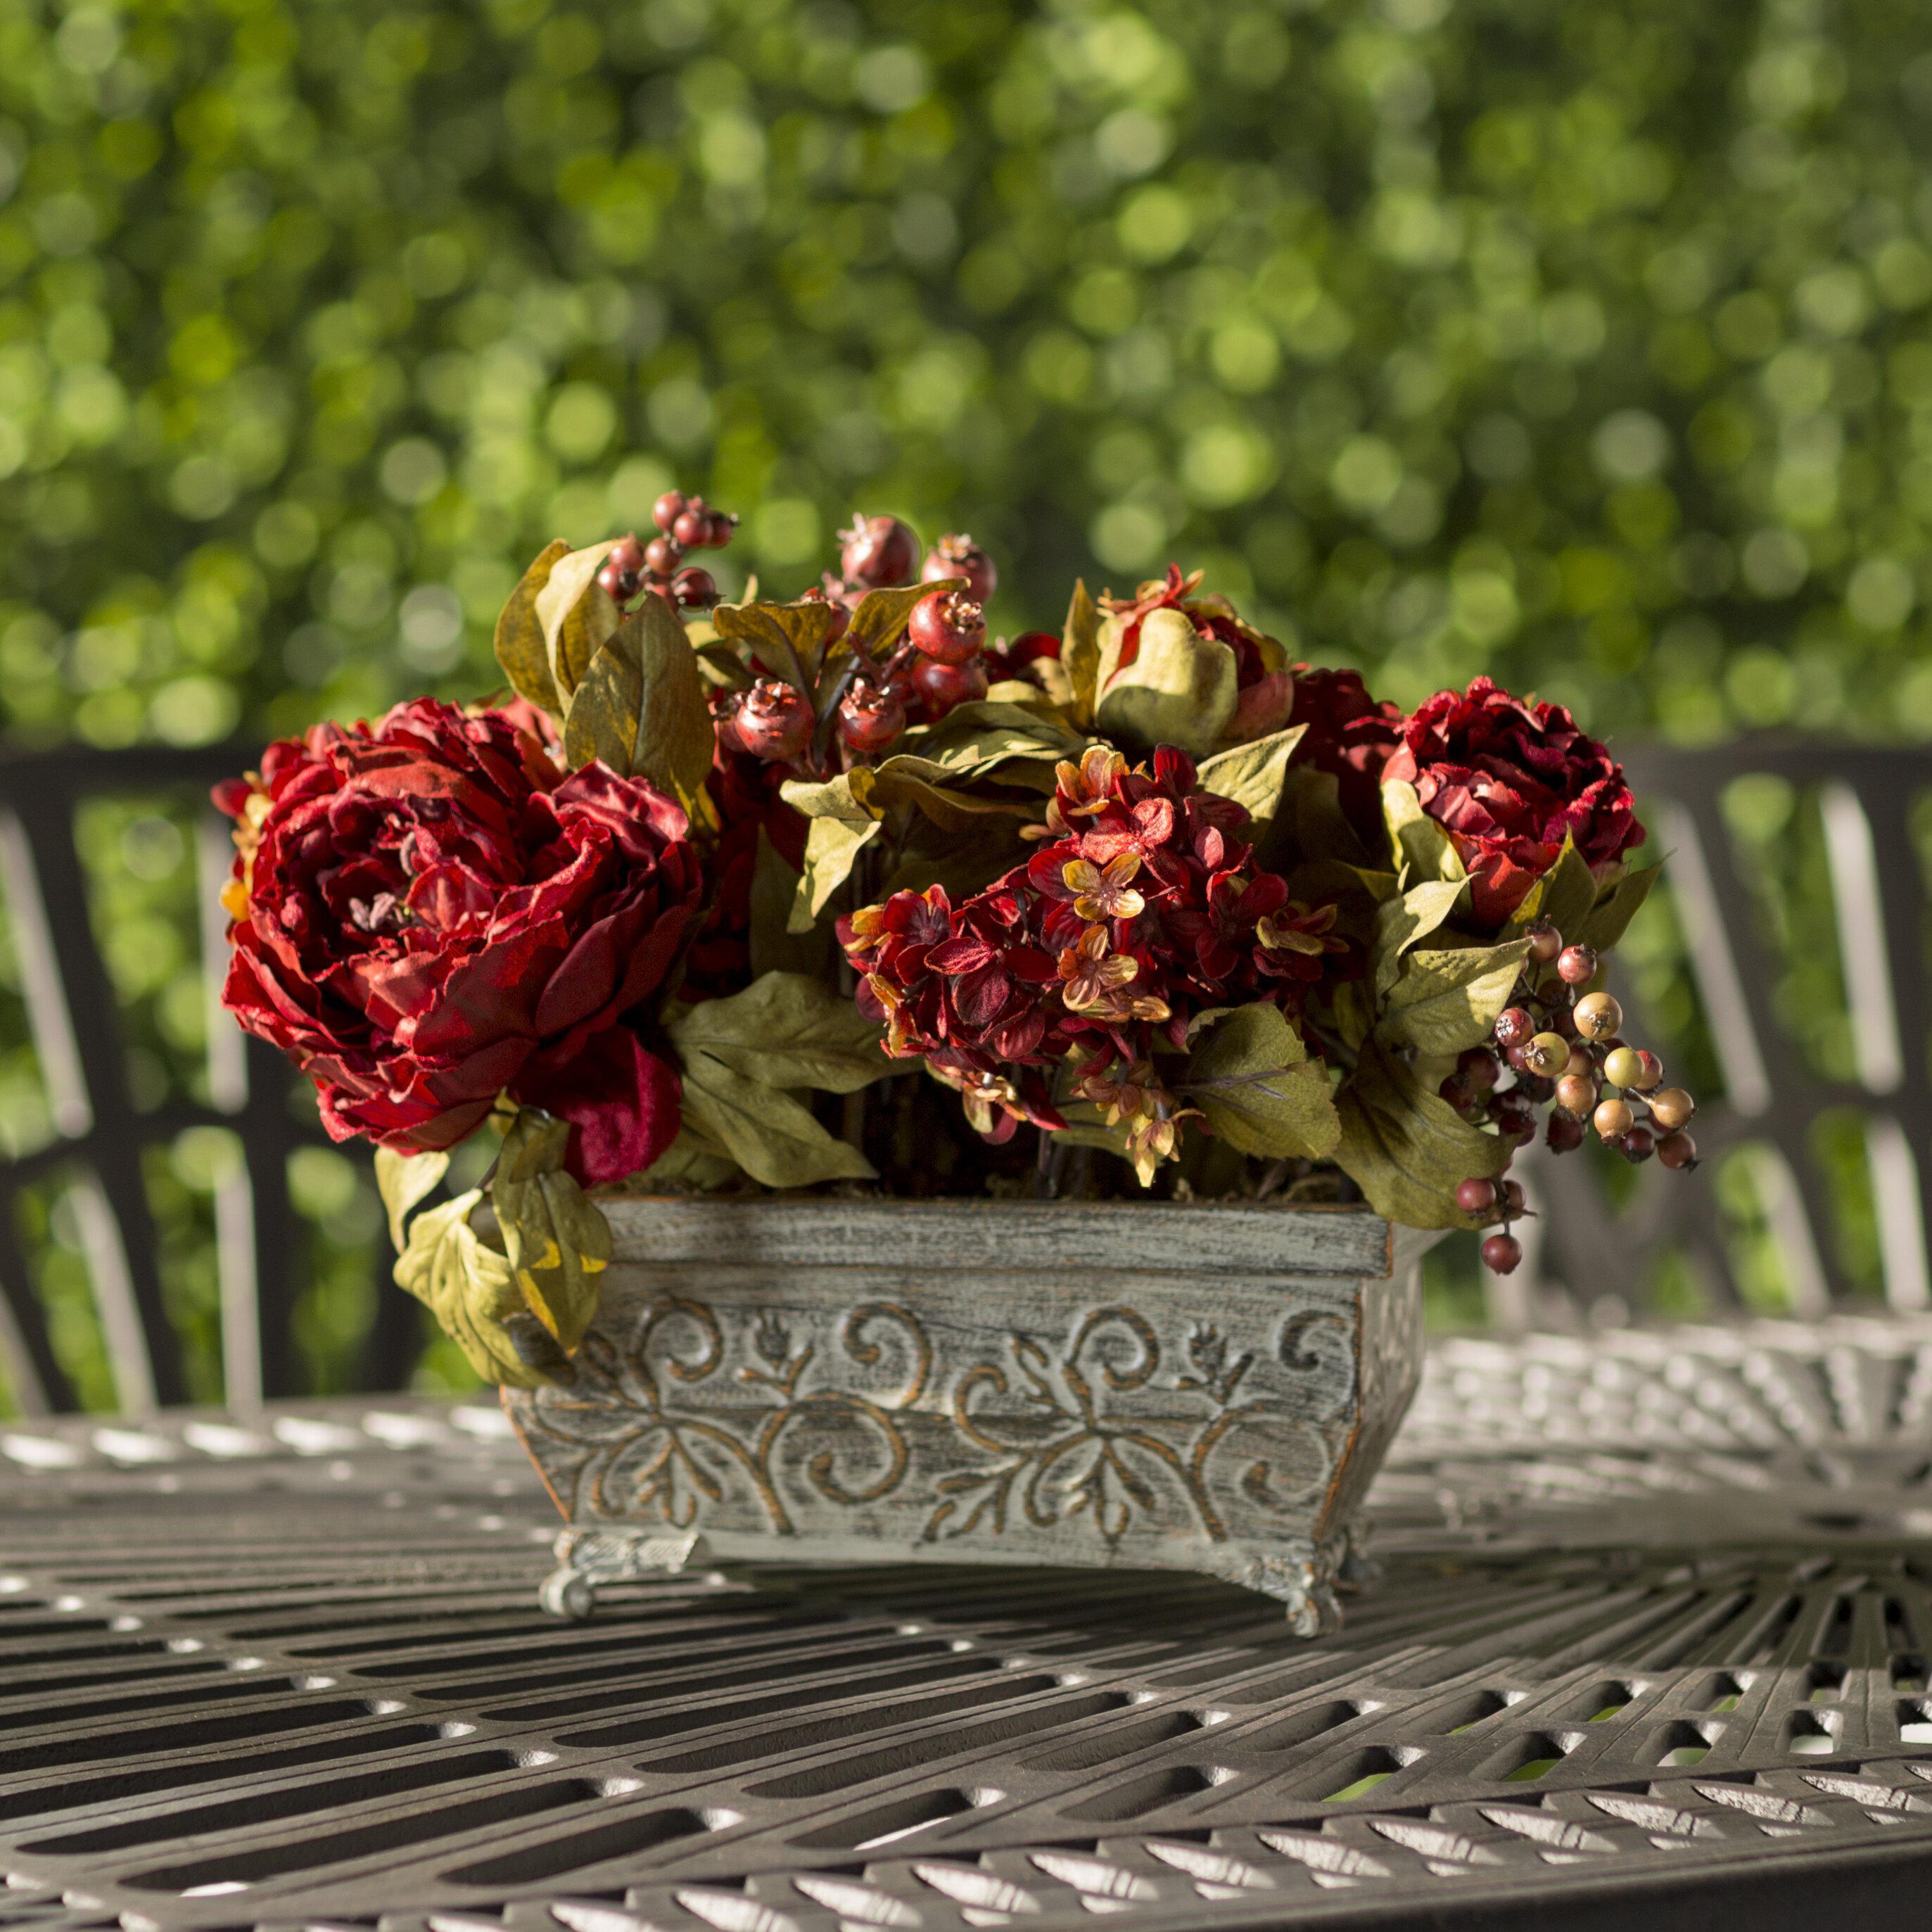 Astoria Grand Peony And Hydrangea Centerpiece In Planter Reviews Wayfair